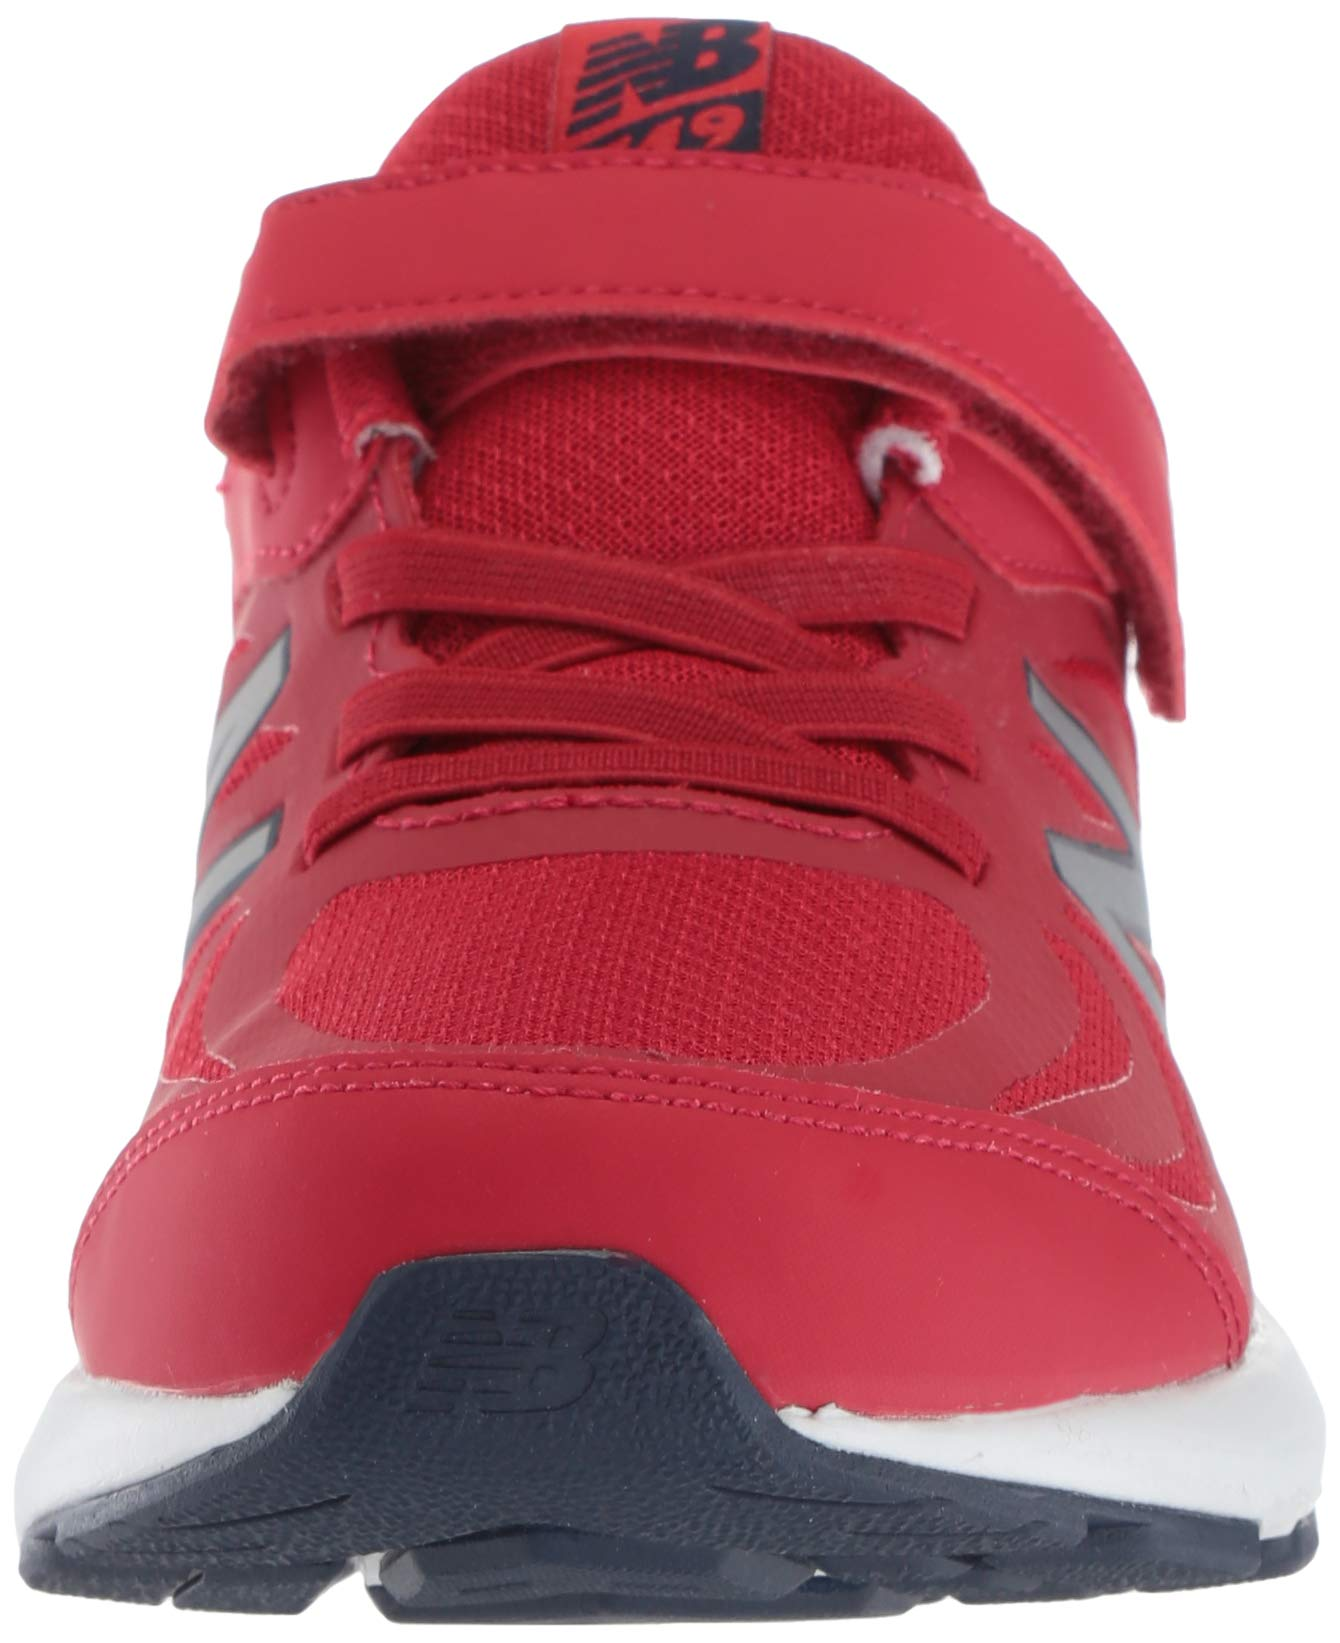 New Balance Boys' 519v1 Hook and Loop Running Shoe, Chili Pepper/Nubuck Scarlet, 2 M US Infant by New Balance (Image #4)